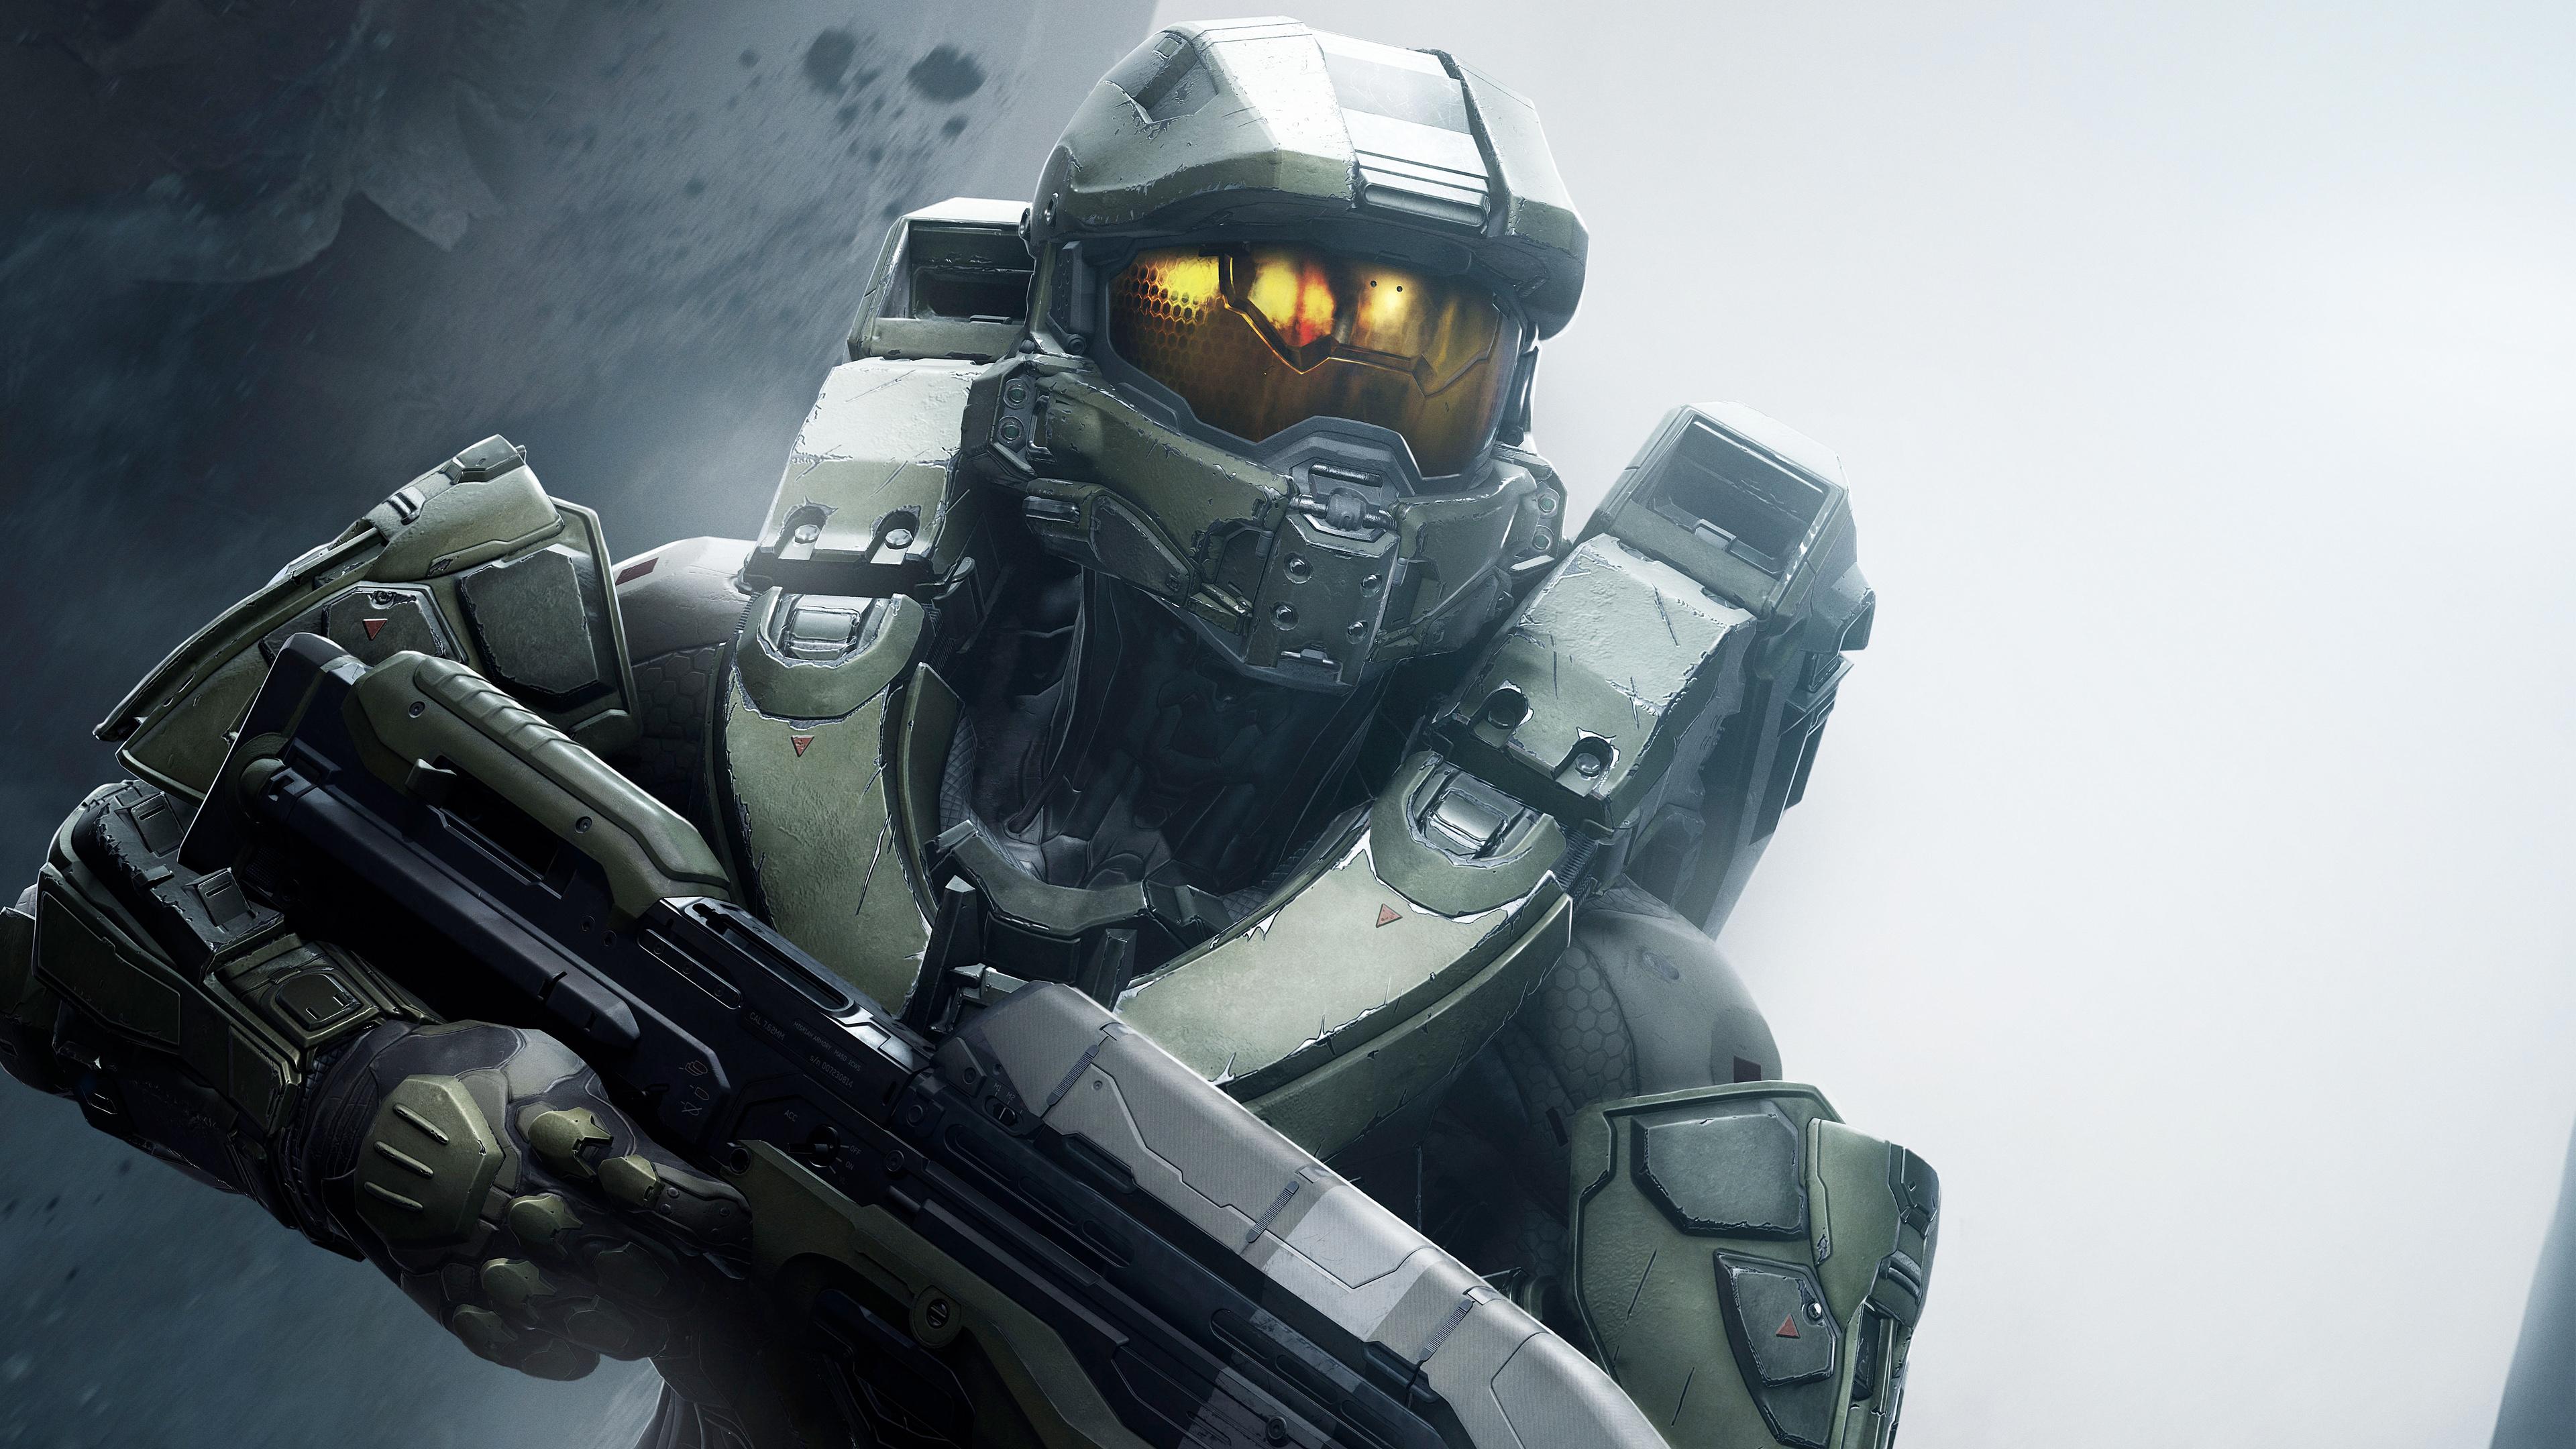 Halo 5 игра  № 2310803 загрузить